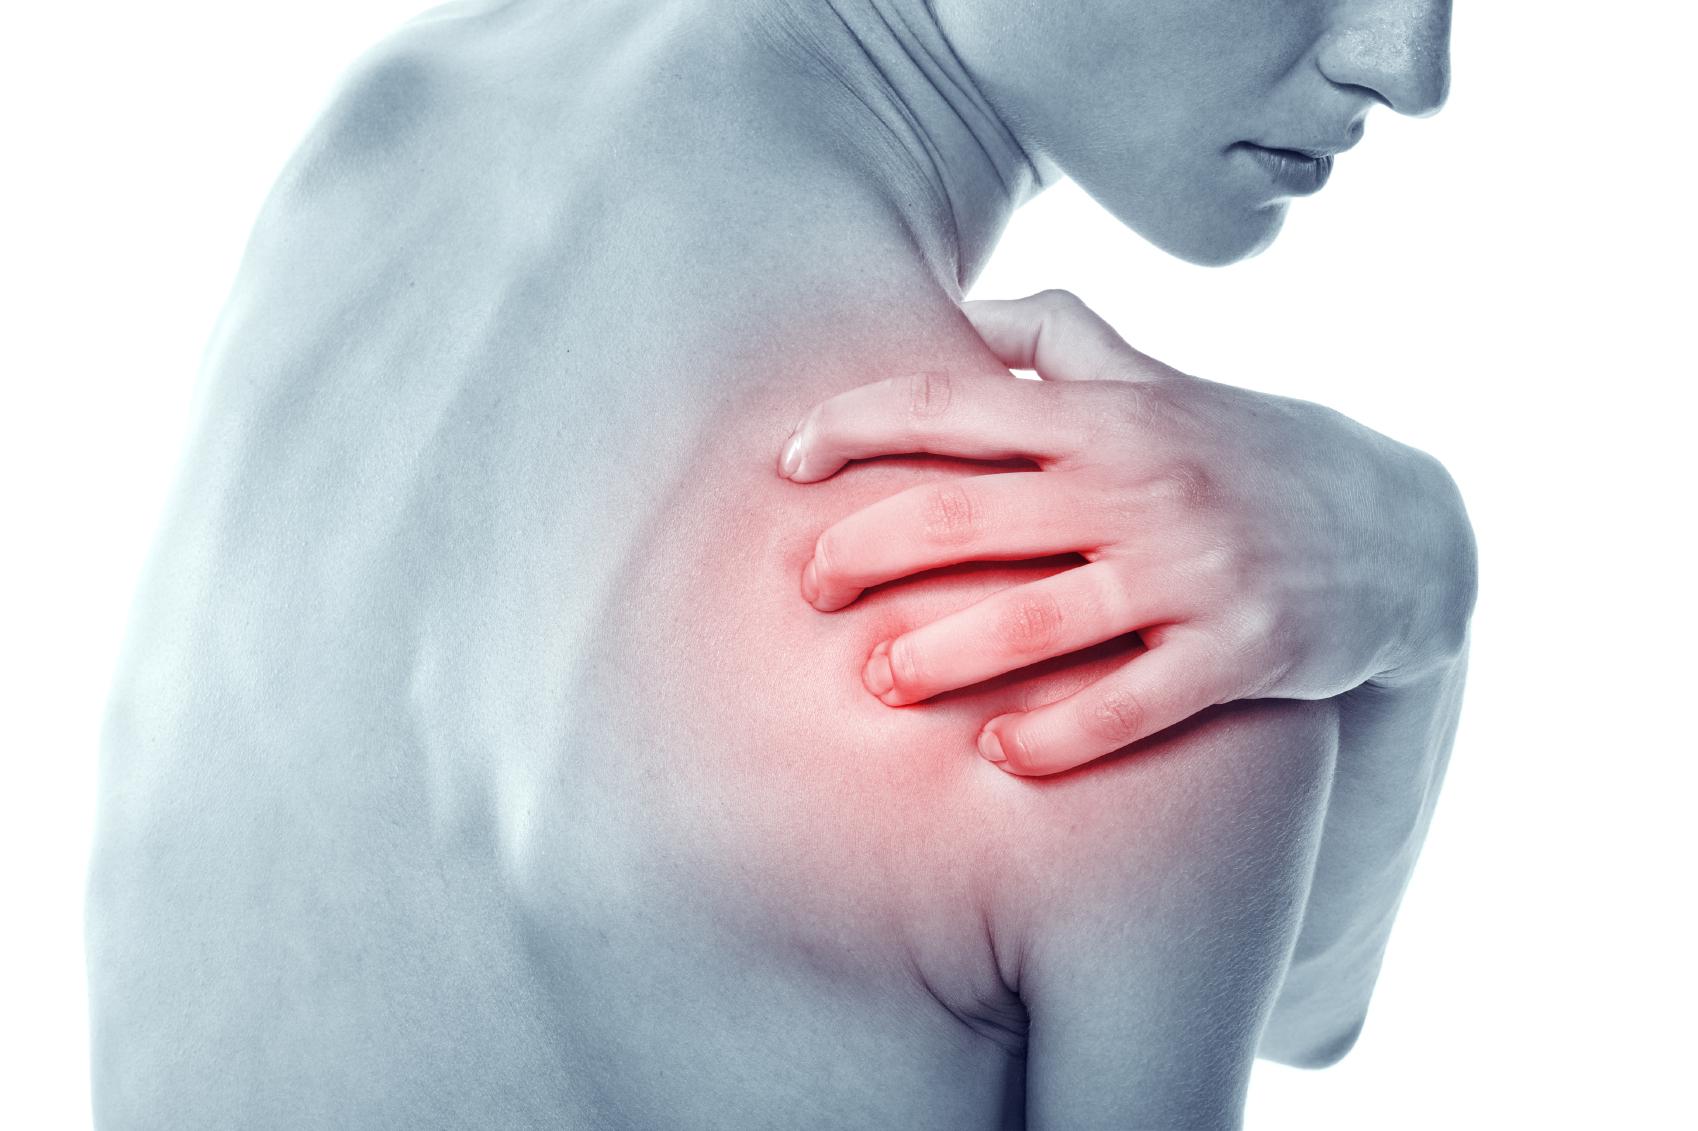 Artritis hombro